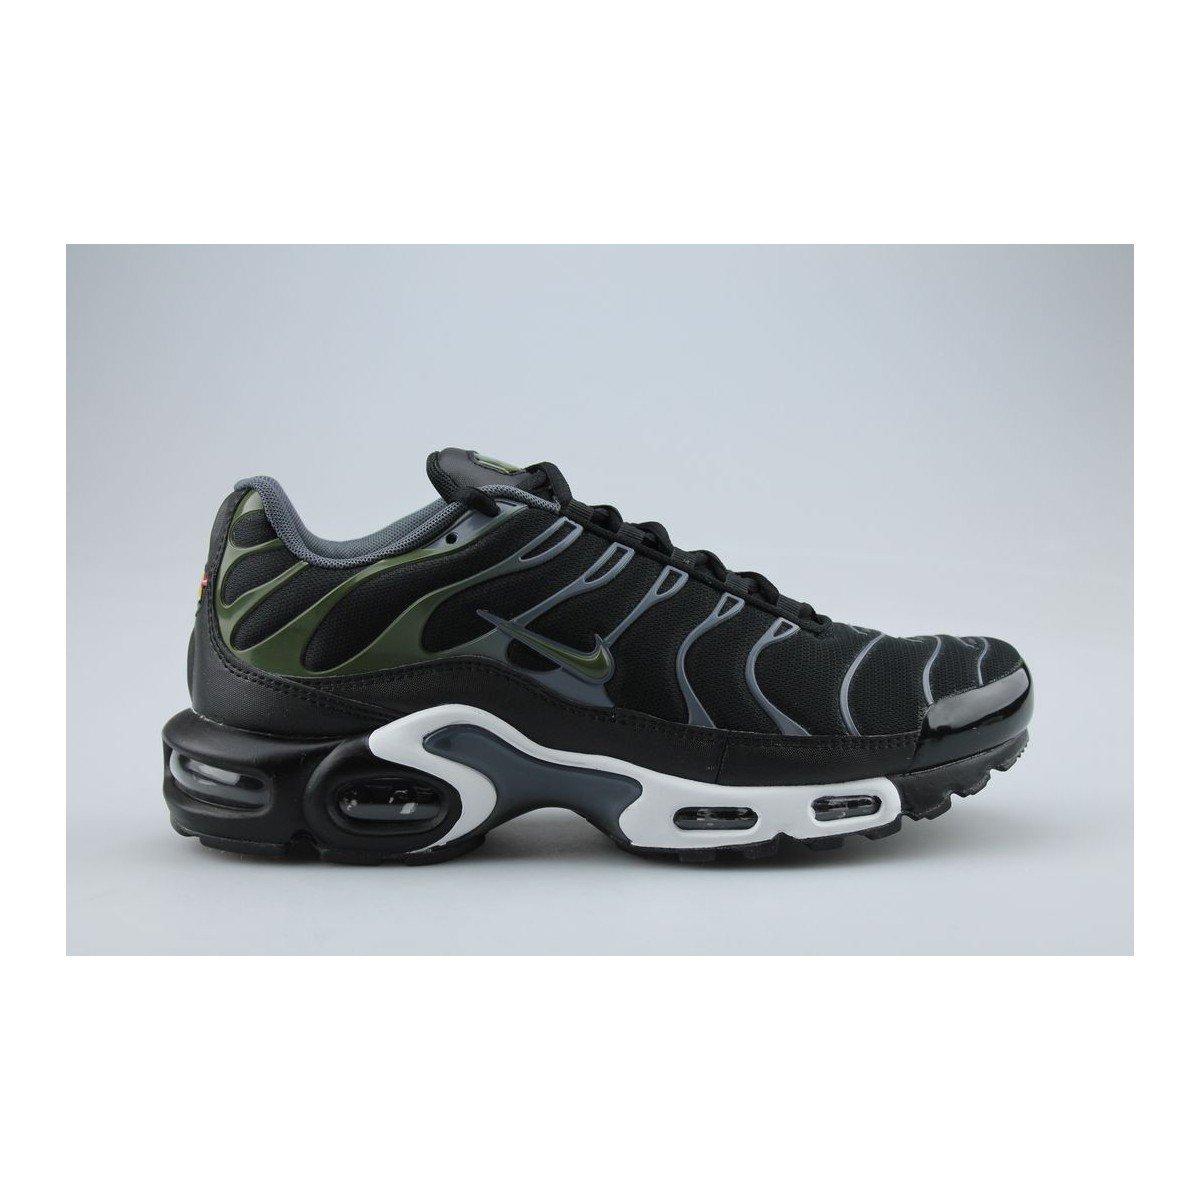 low priced 75cce ec0c8 Amazon.com   Nike Men s Air Max Plus Black Legion Green Dark Grey White  Nylon Cross-Trainers Shoes 9 M US   Fitness   Cross-Training